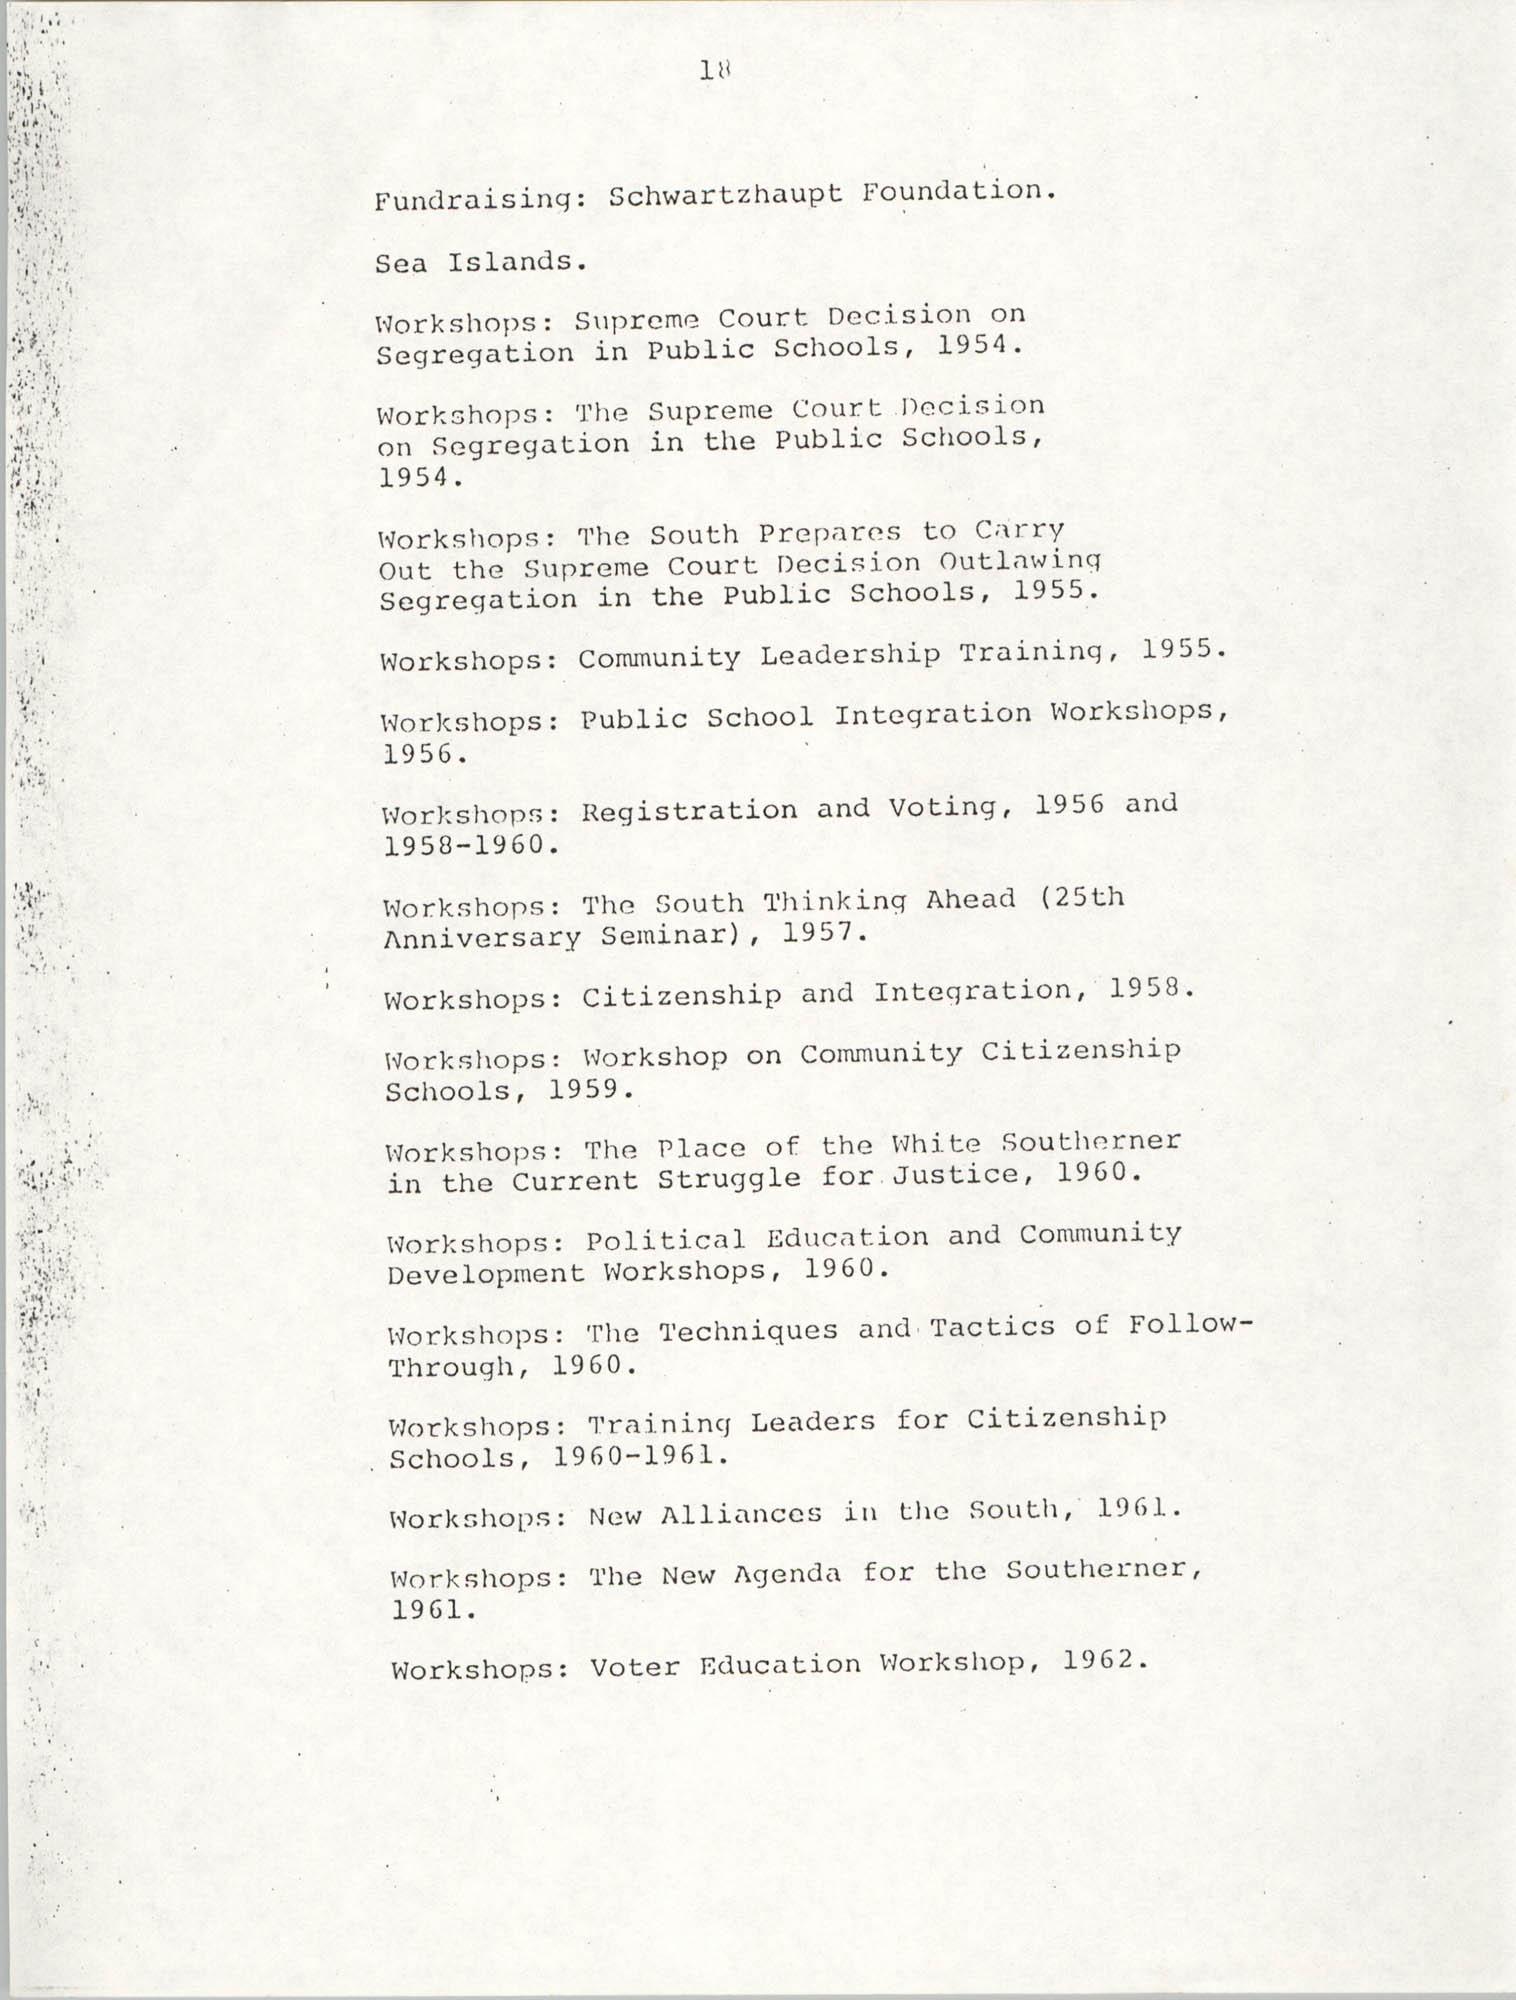 Dissertation Proposal, Page 18